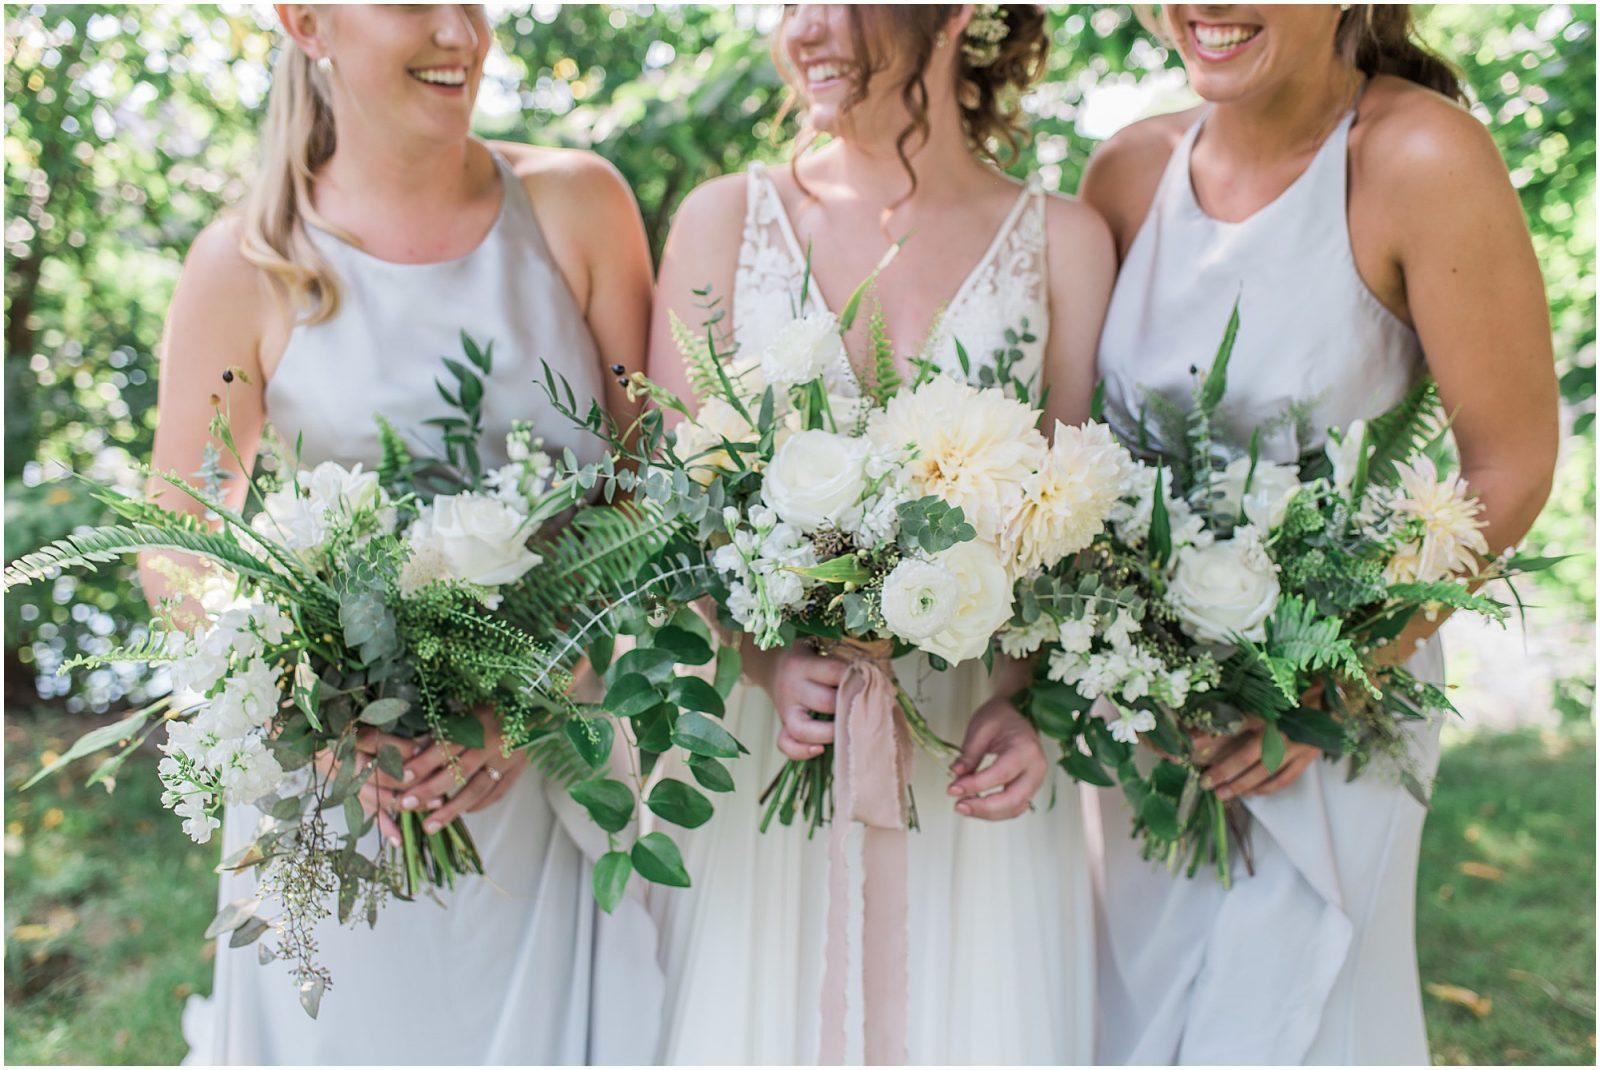 Lush green and white bouquet - ottawa - lush wedding